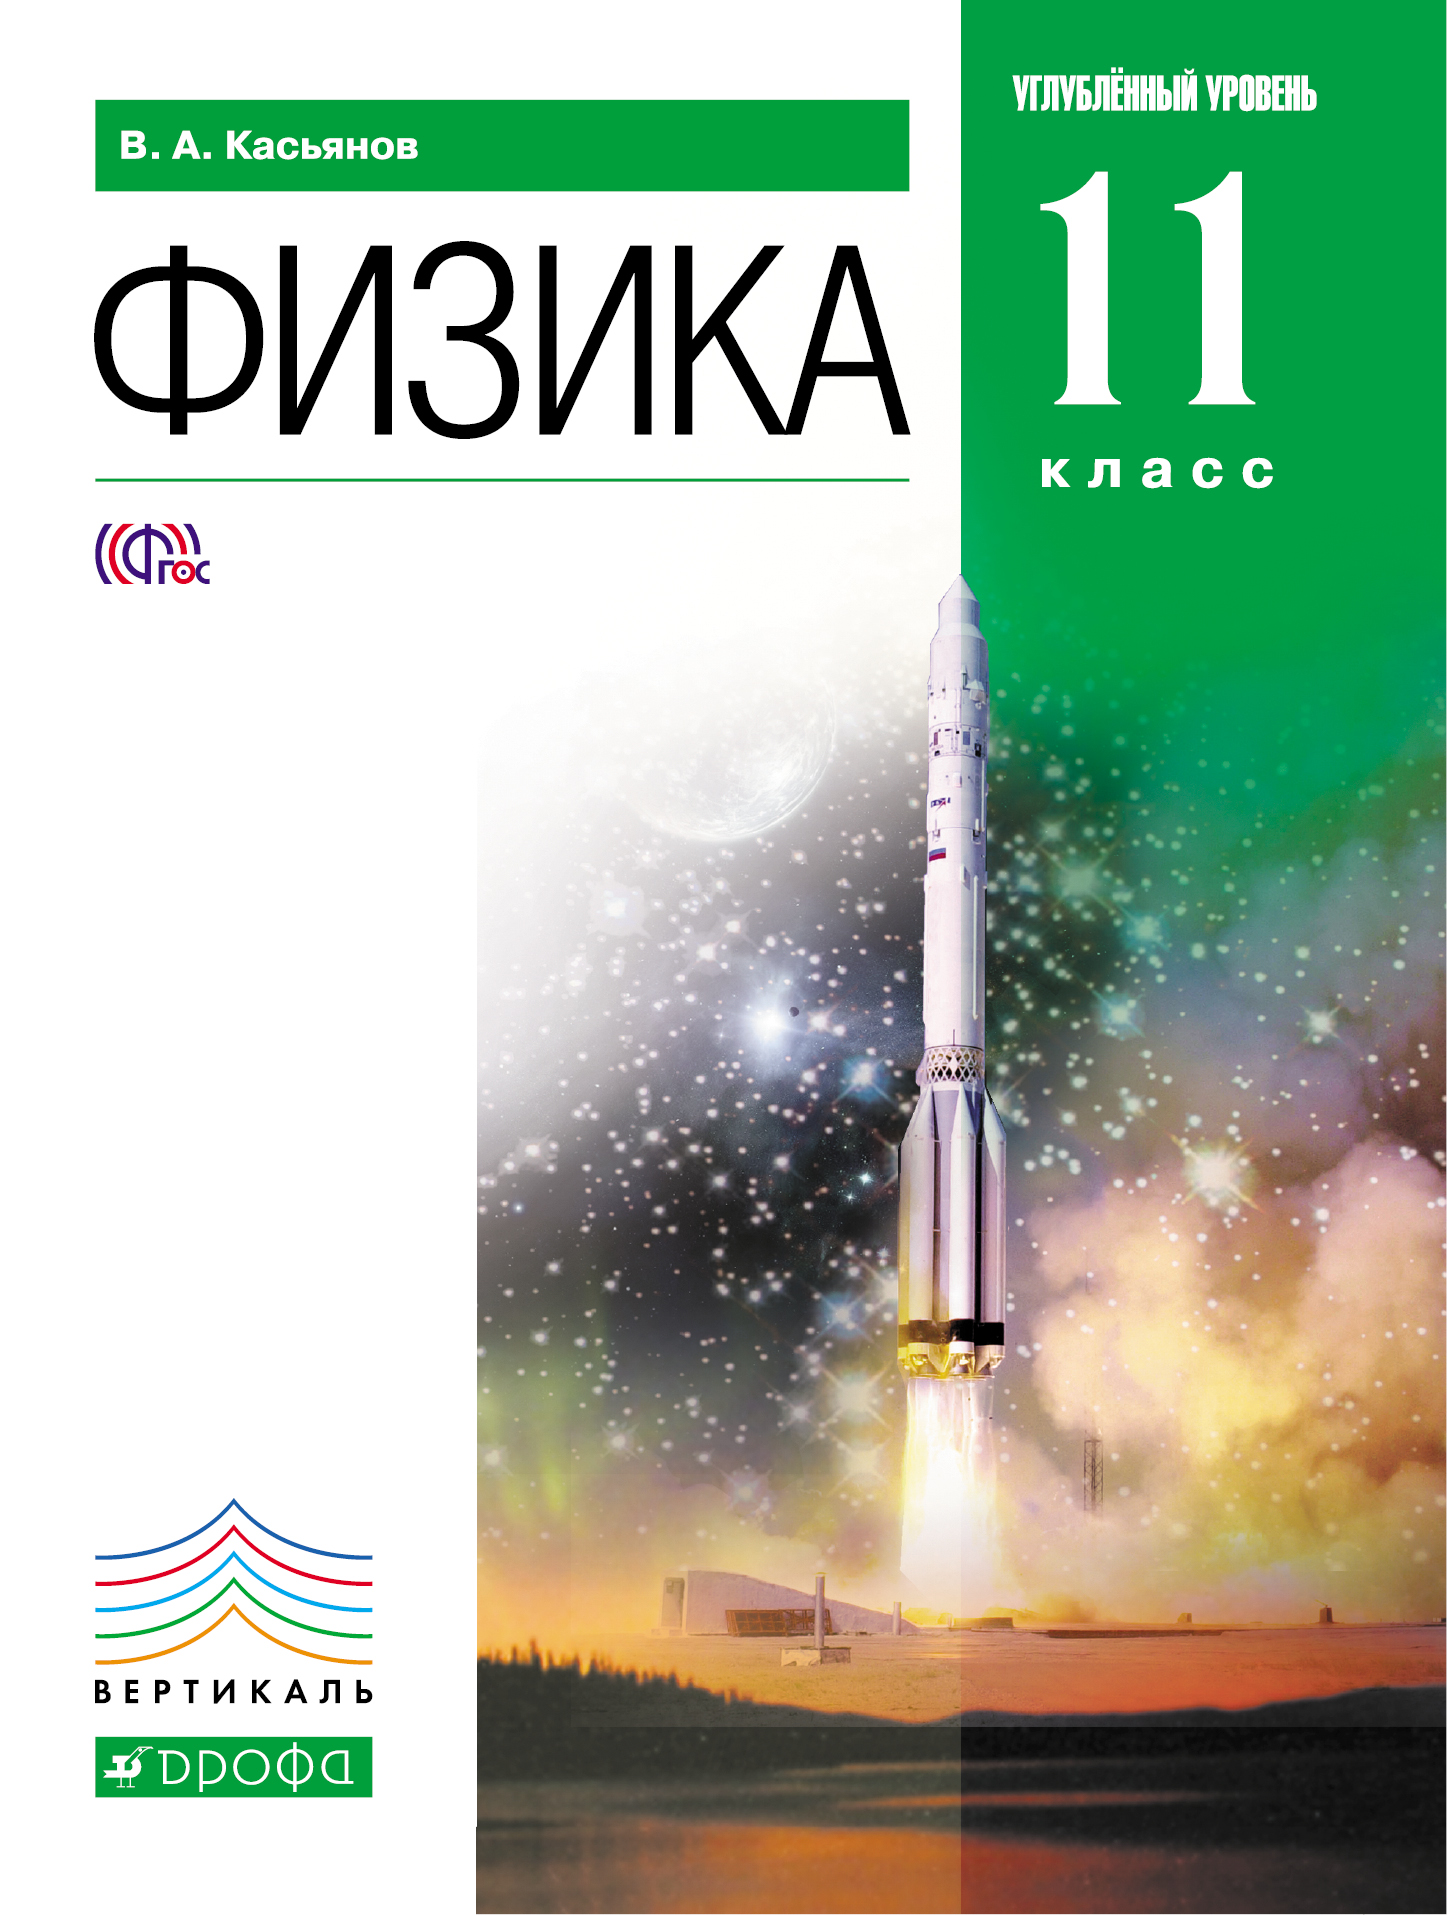 Физика 11кл [Учебник] угл. ур. Вертикаль